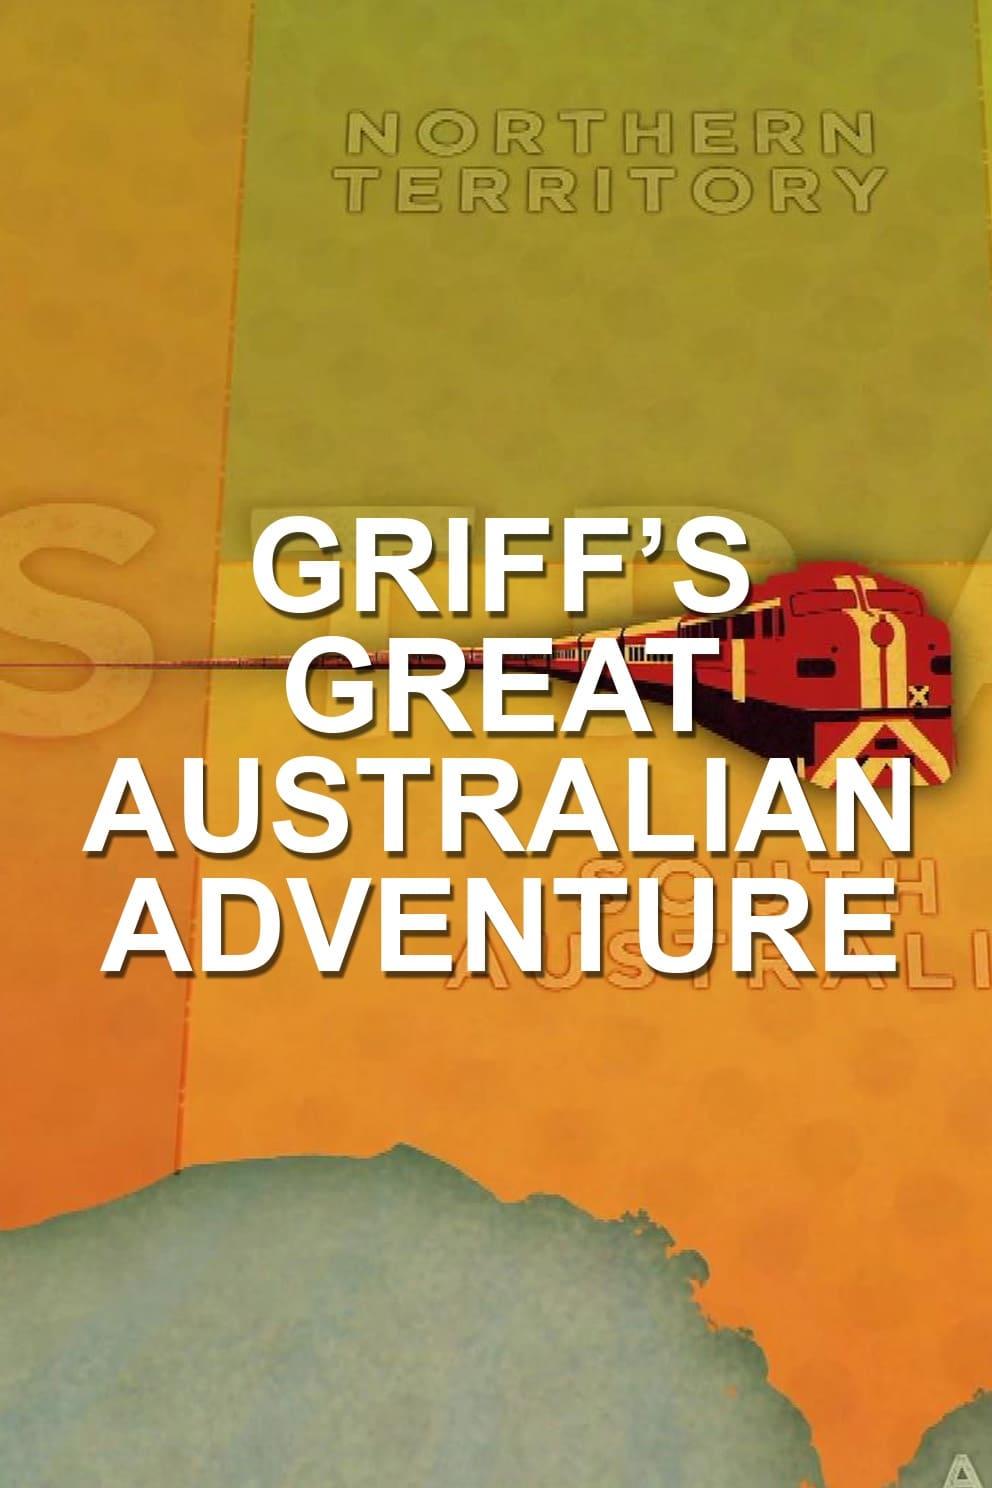 Griff's Great Australian Rail Trip TV Shows About Rain